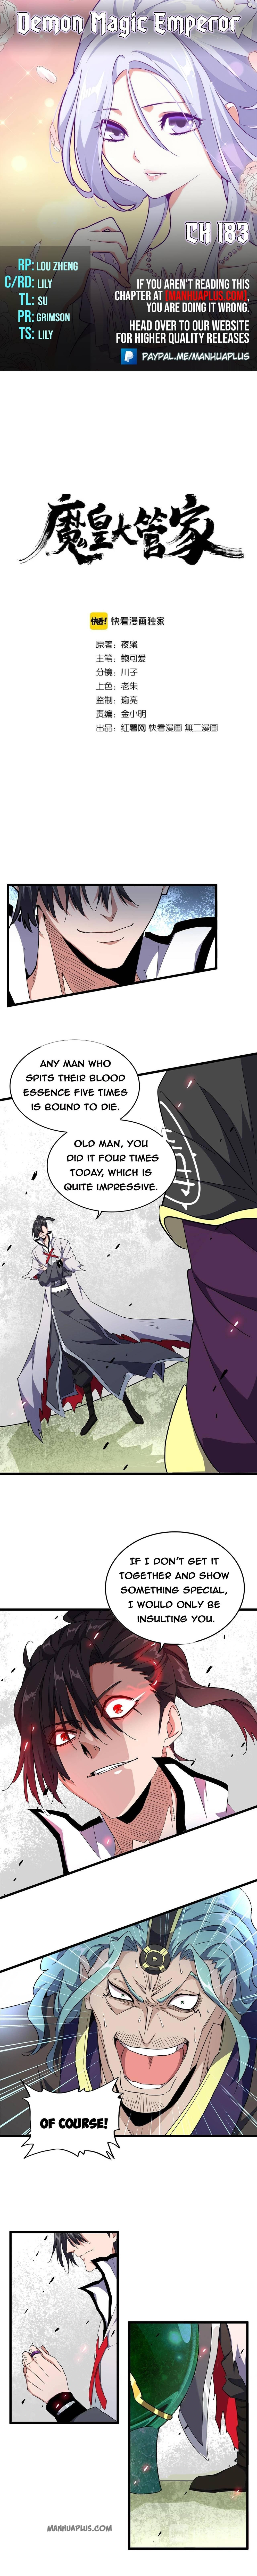 Manga Magic Emperor - Chapter 183 Page 1